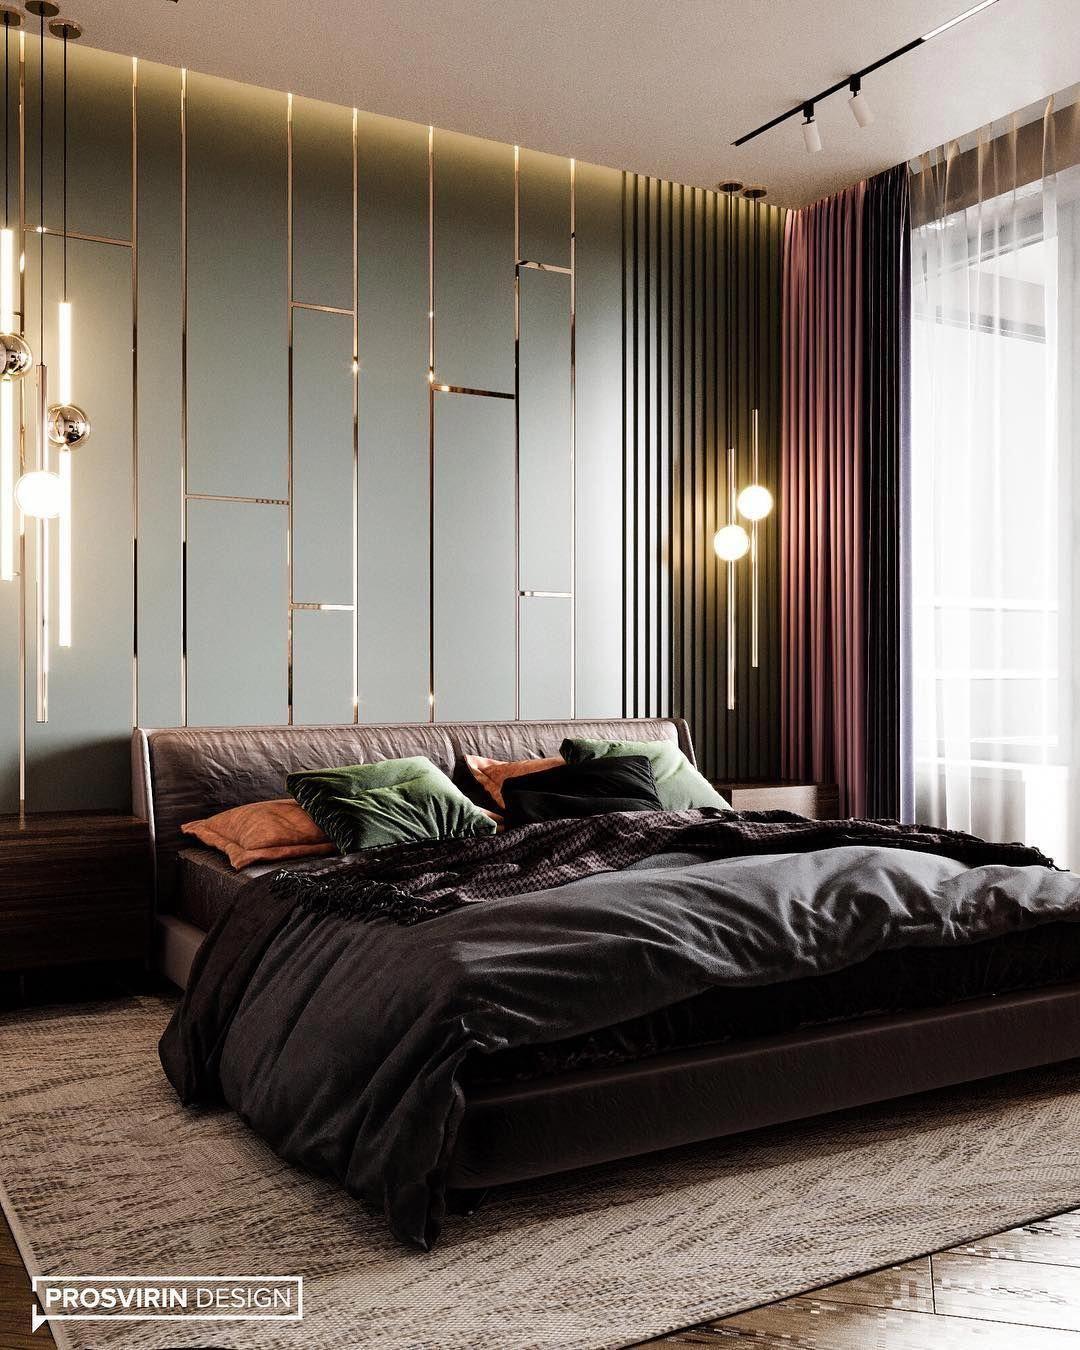 Home Decoration Shops Near Me Key: 5727895821 | Modern luxury bedroom,  Luxury bedroom master, Luxury room bedroom